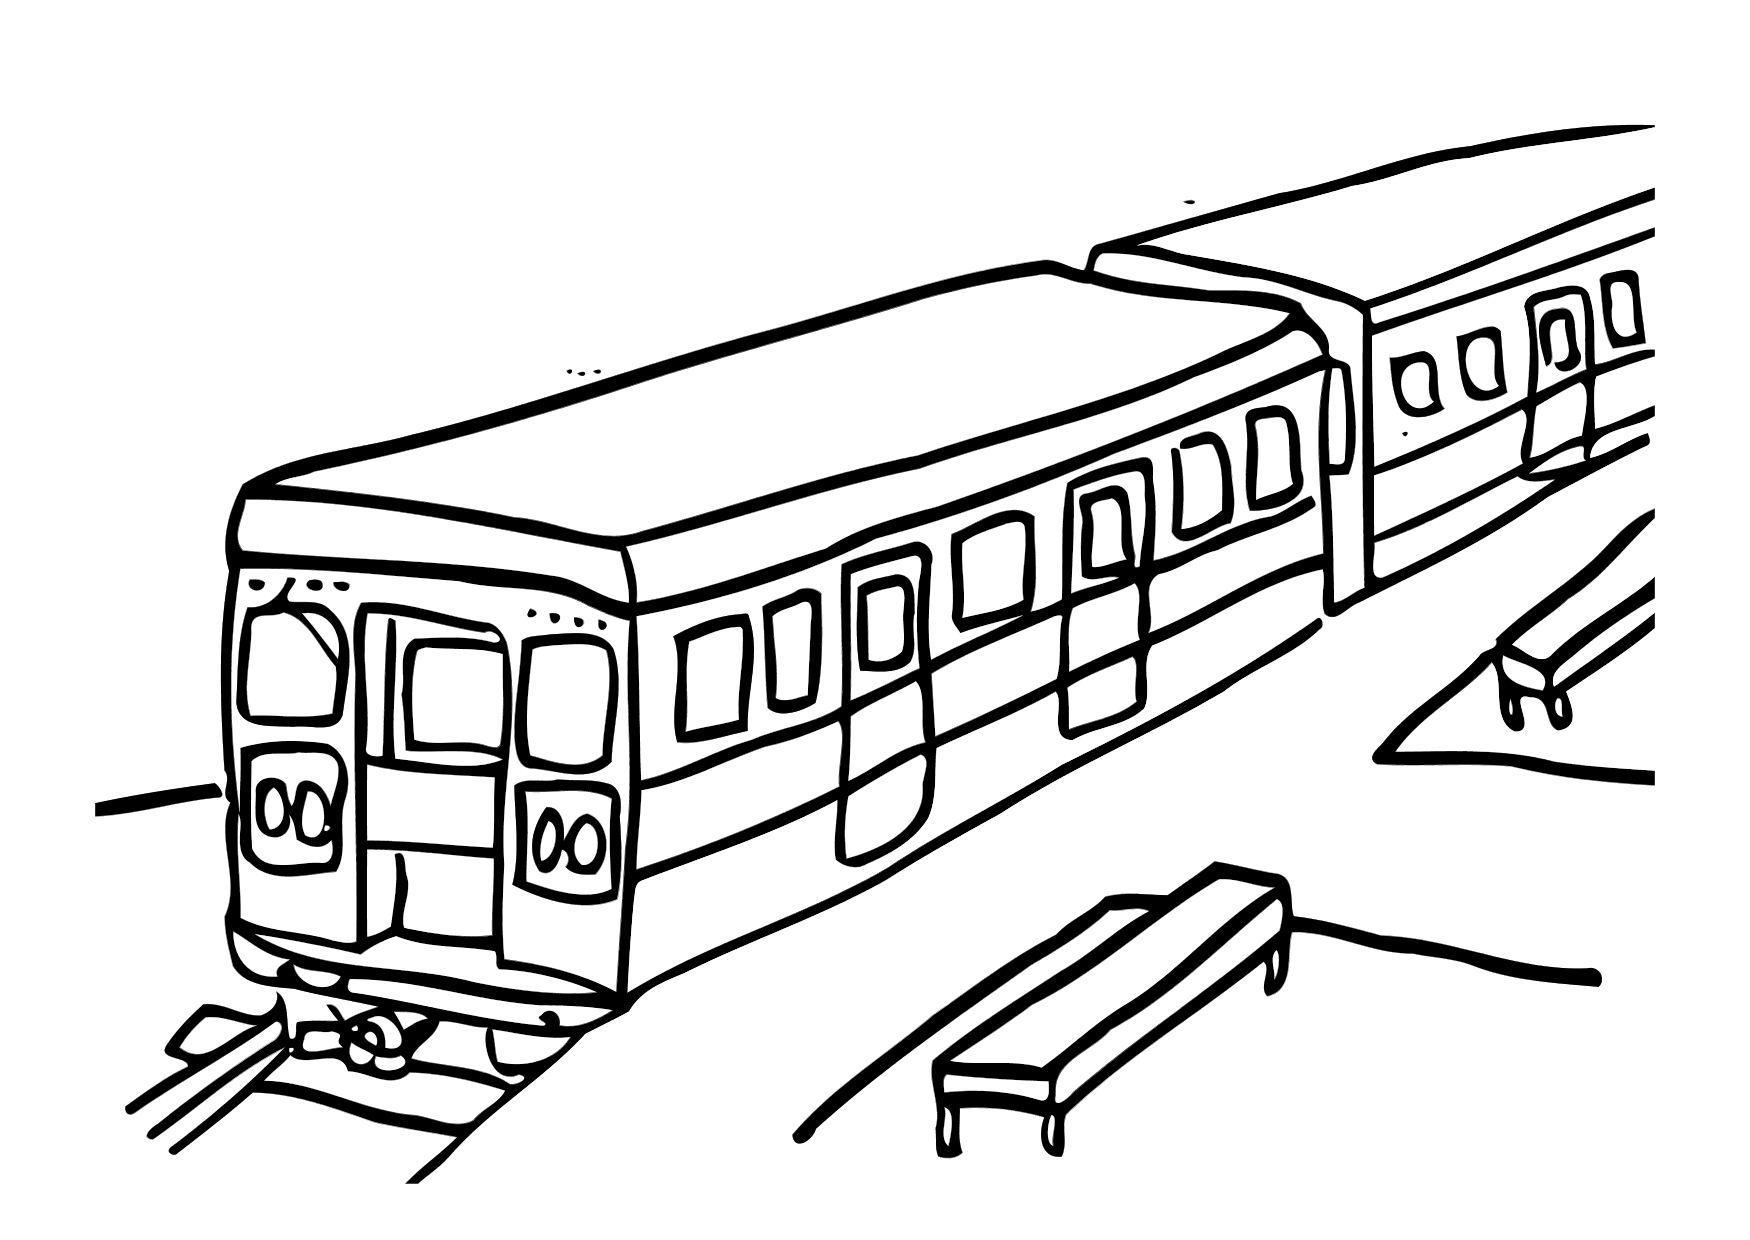 Malvorlage Eisenbahn | Ausmalbild 12303.